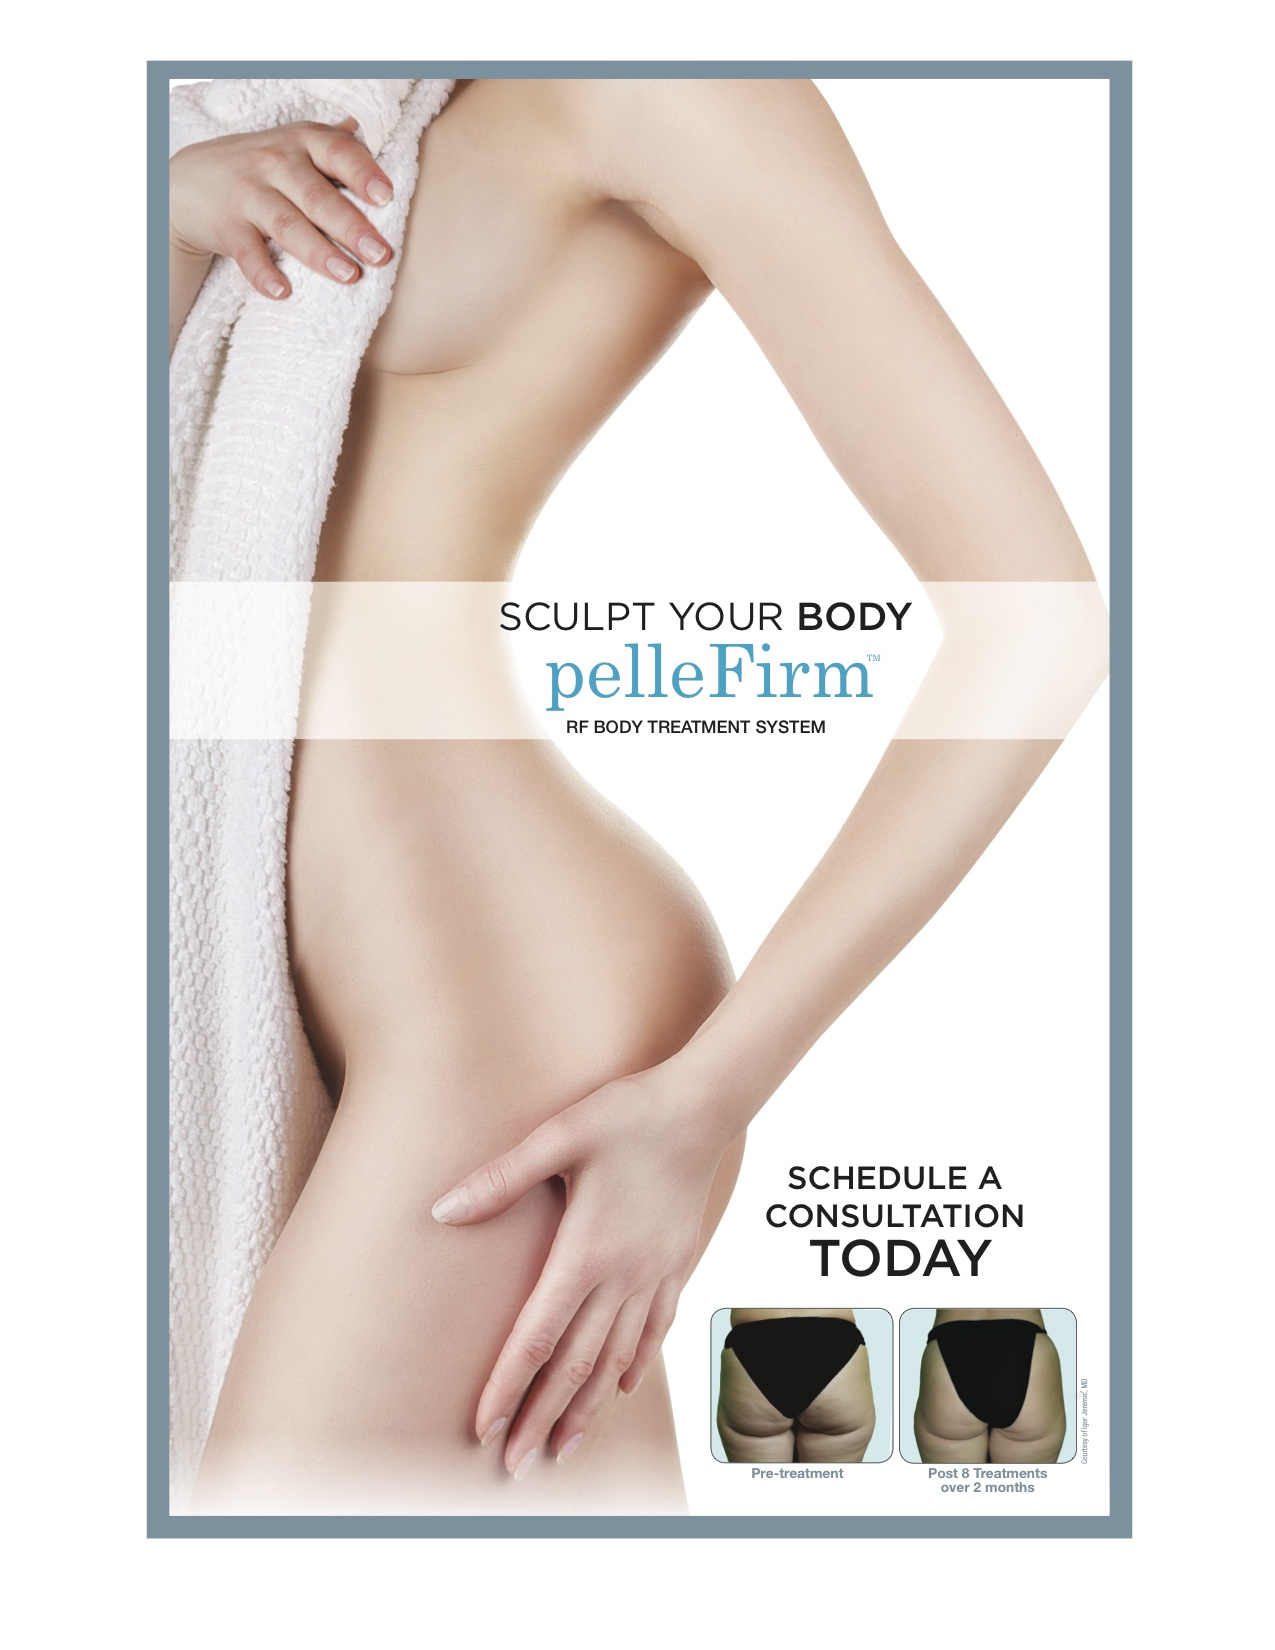 Pellefirm - Remove Cellulite - Fat Reduction